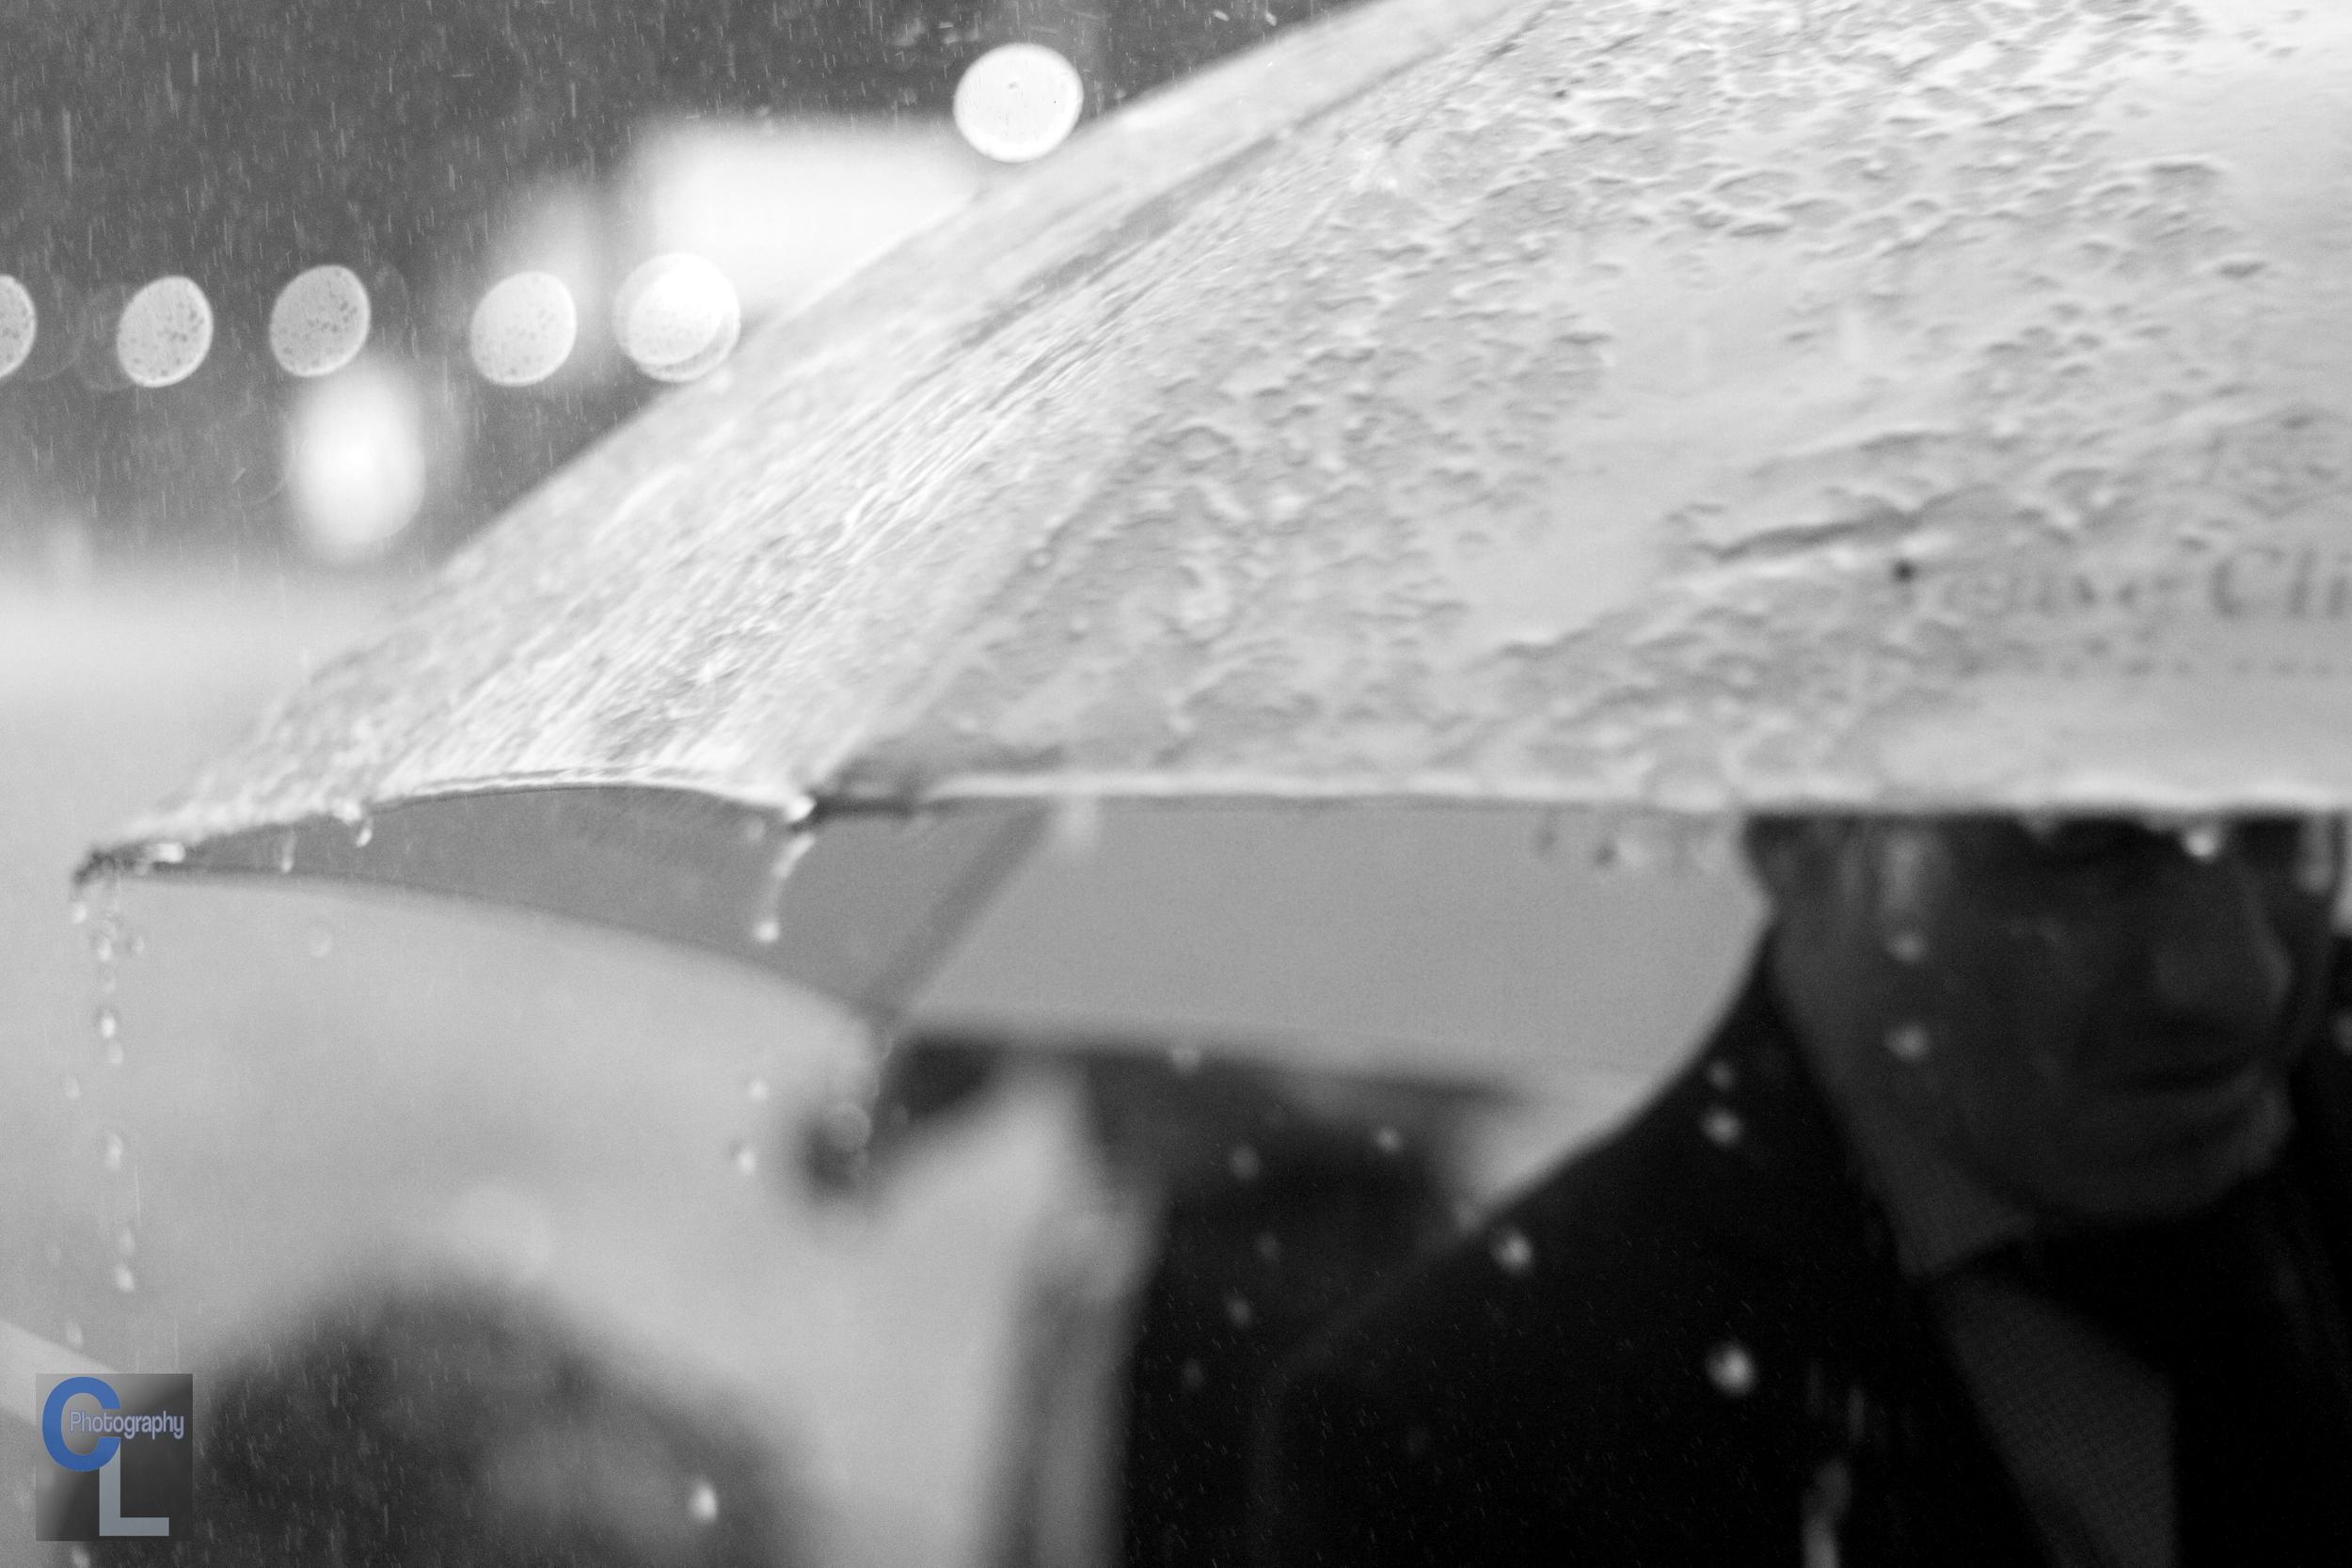 IMG_1484 rainy days bw clp.JPG